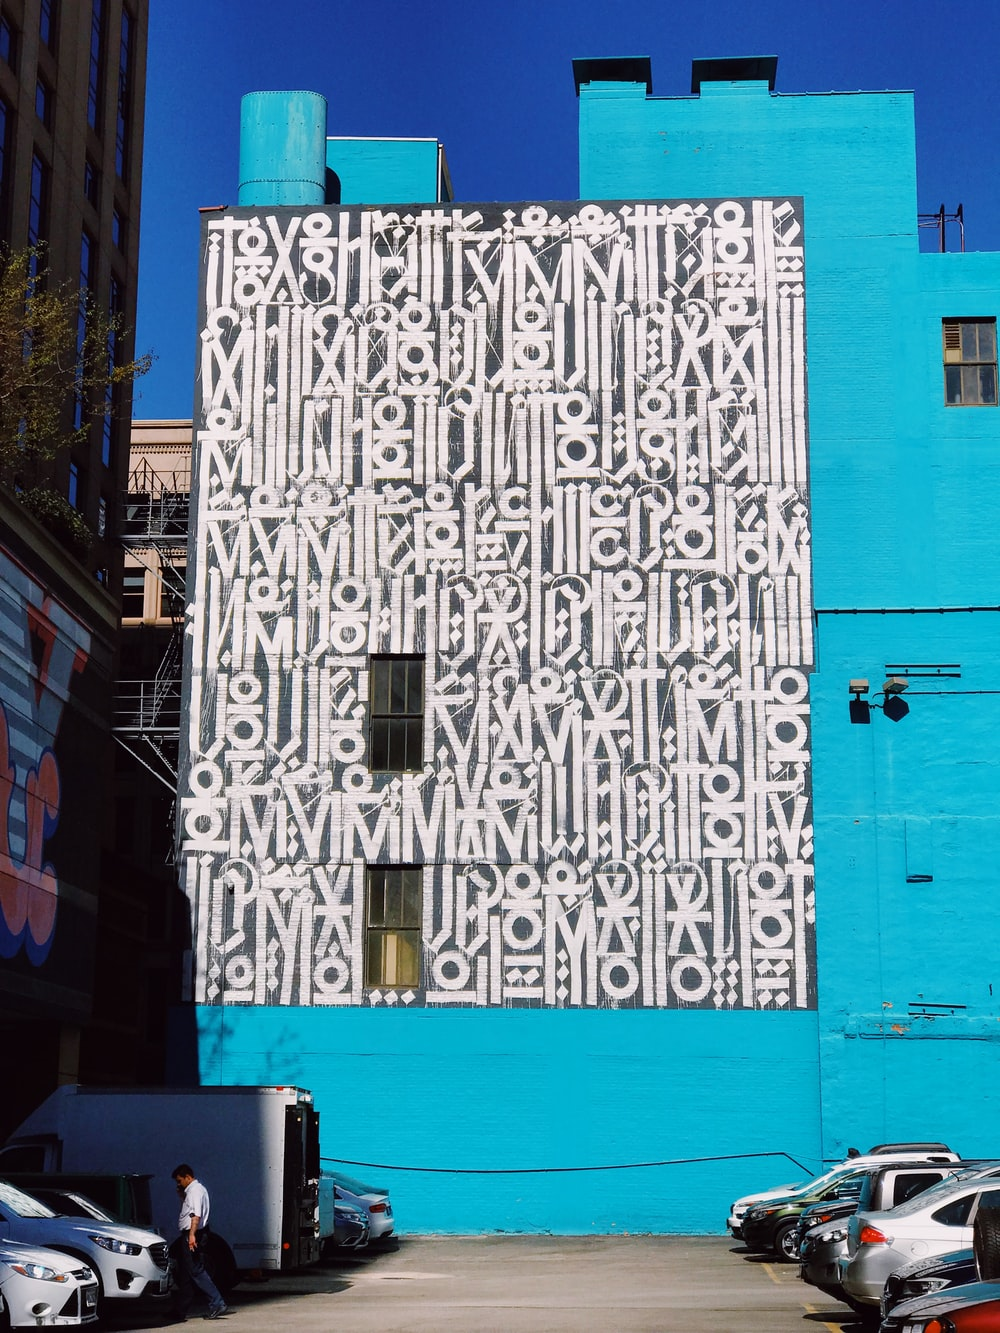 graffiti filled building